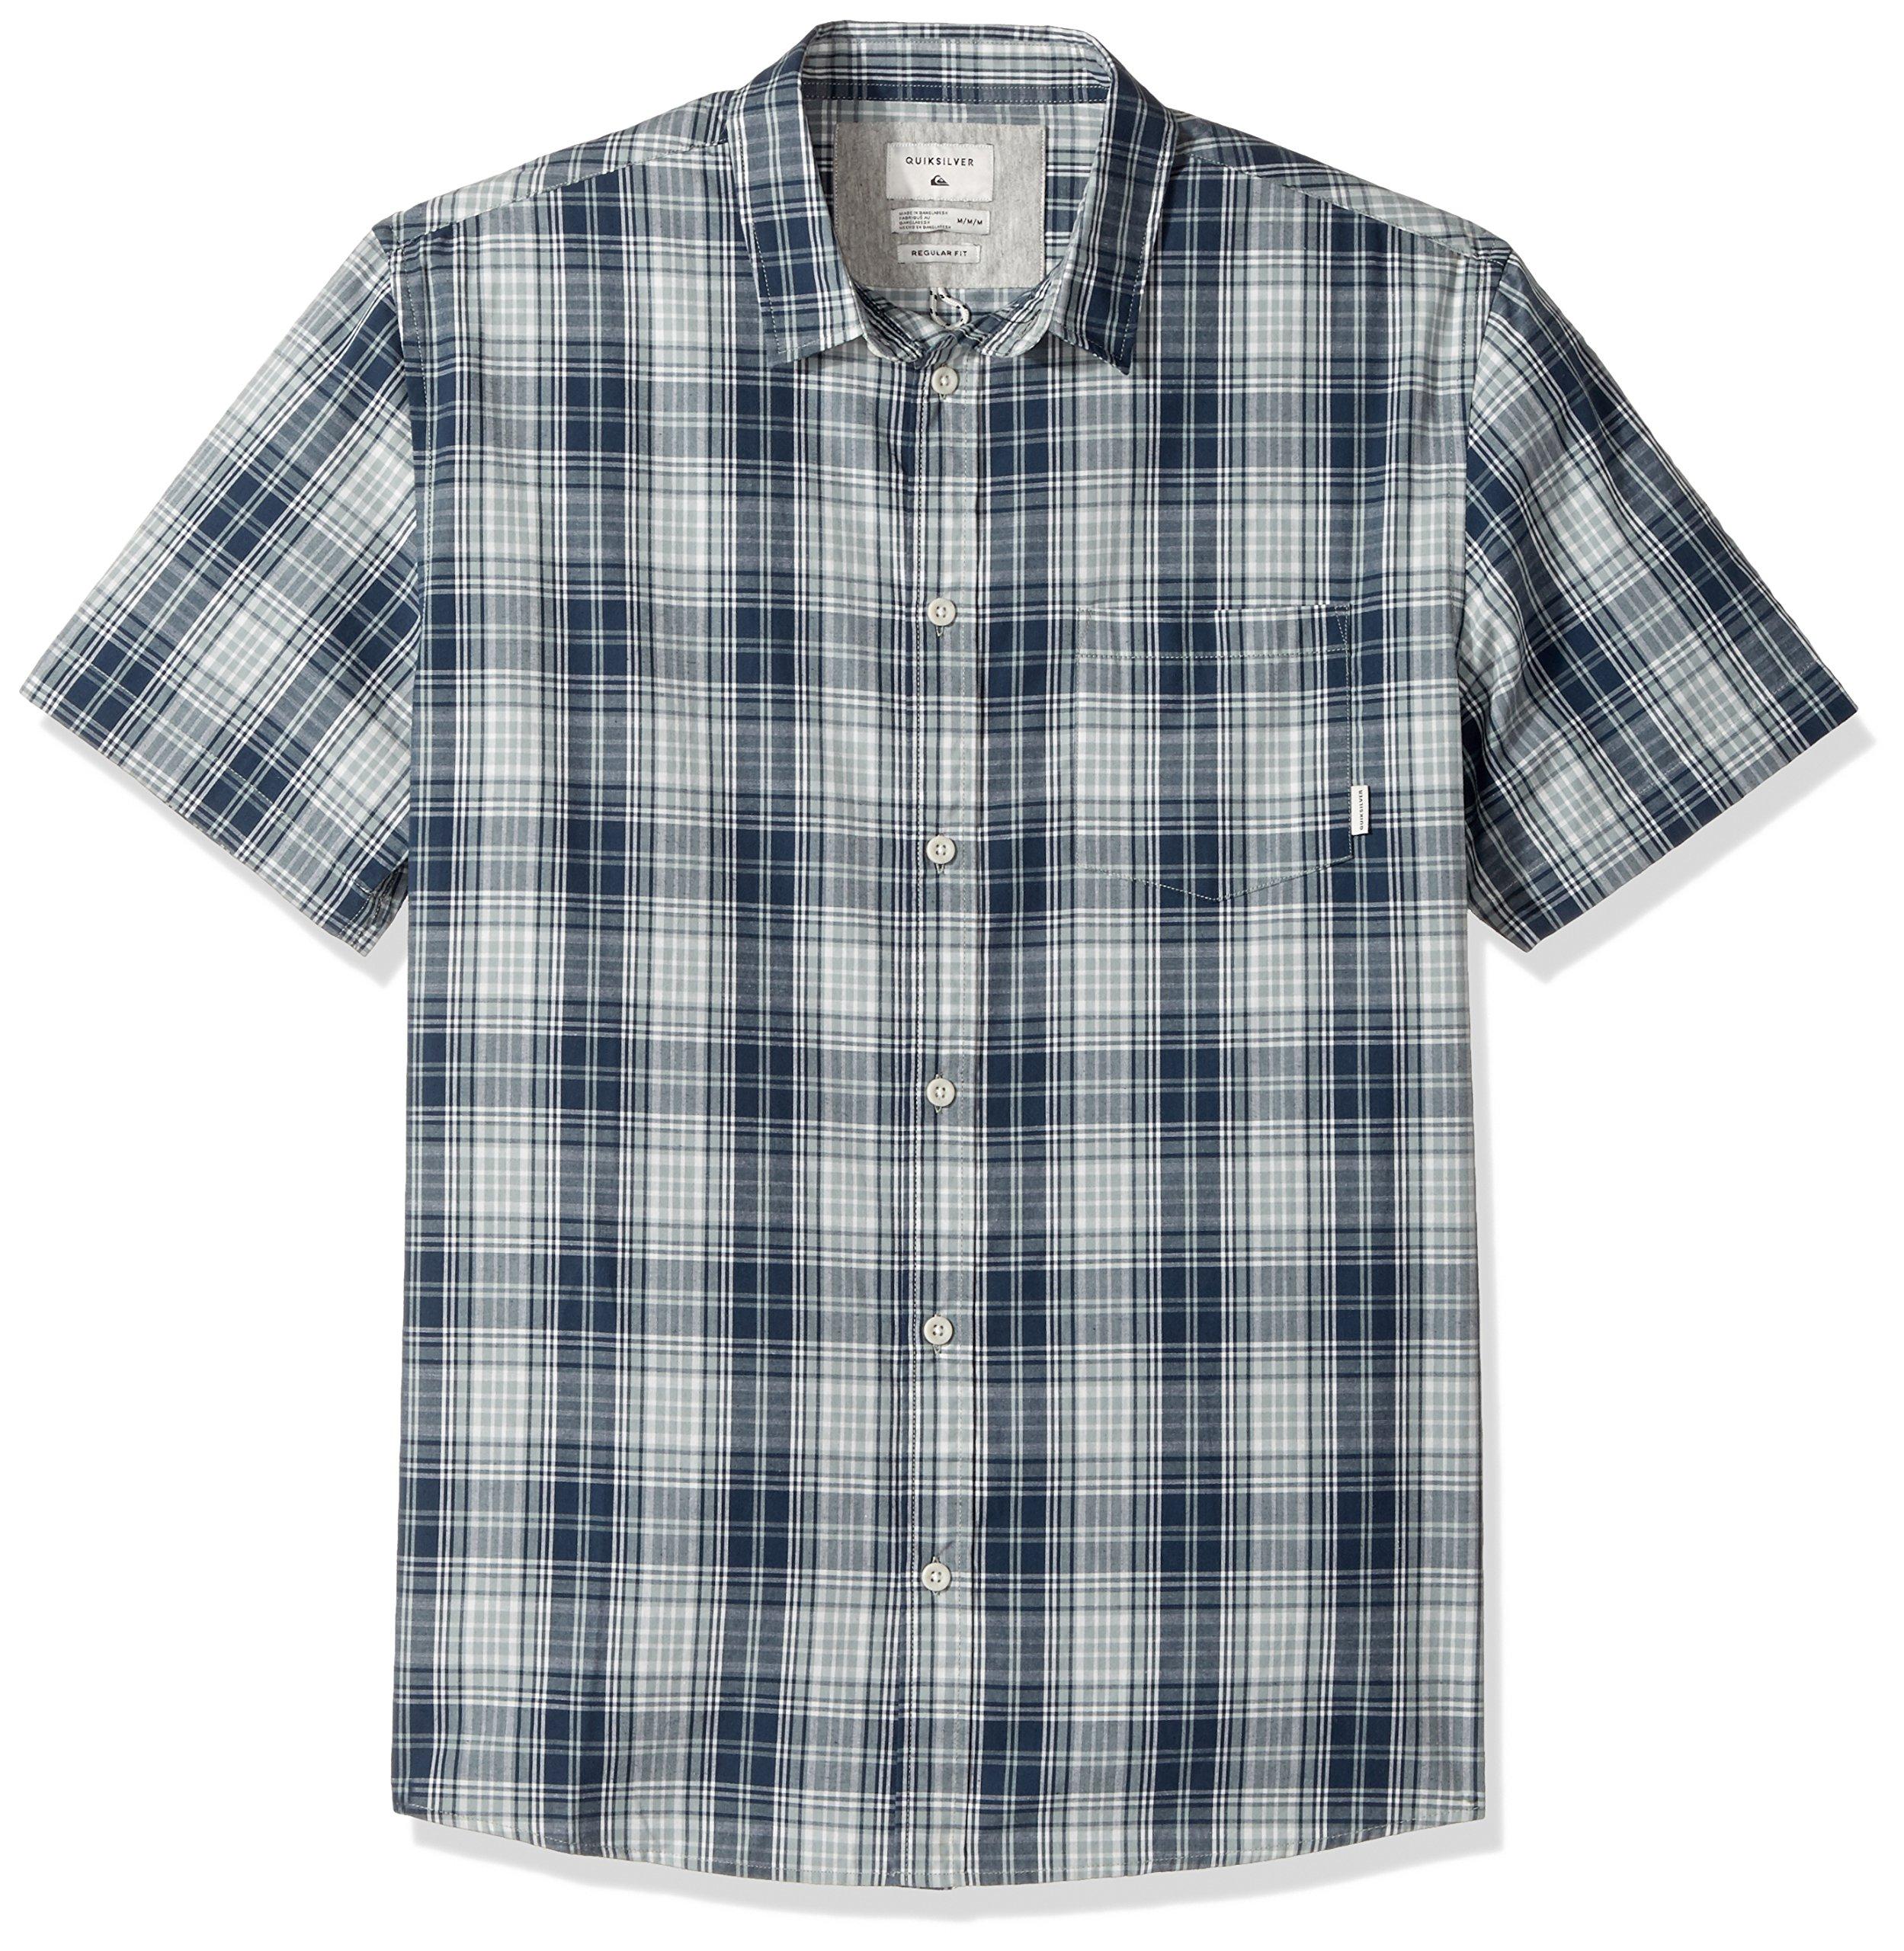 Quiksilver Men's Tidal Short Sleeve Shirt, Slate Gray Tidal, X-Large